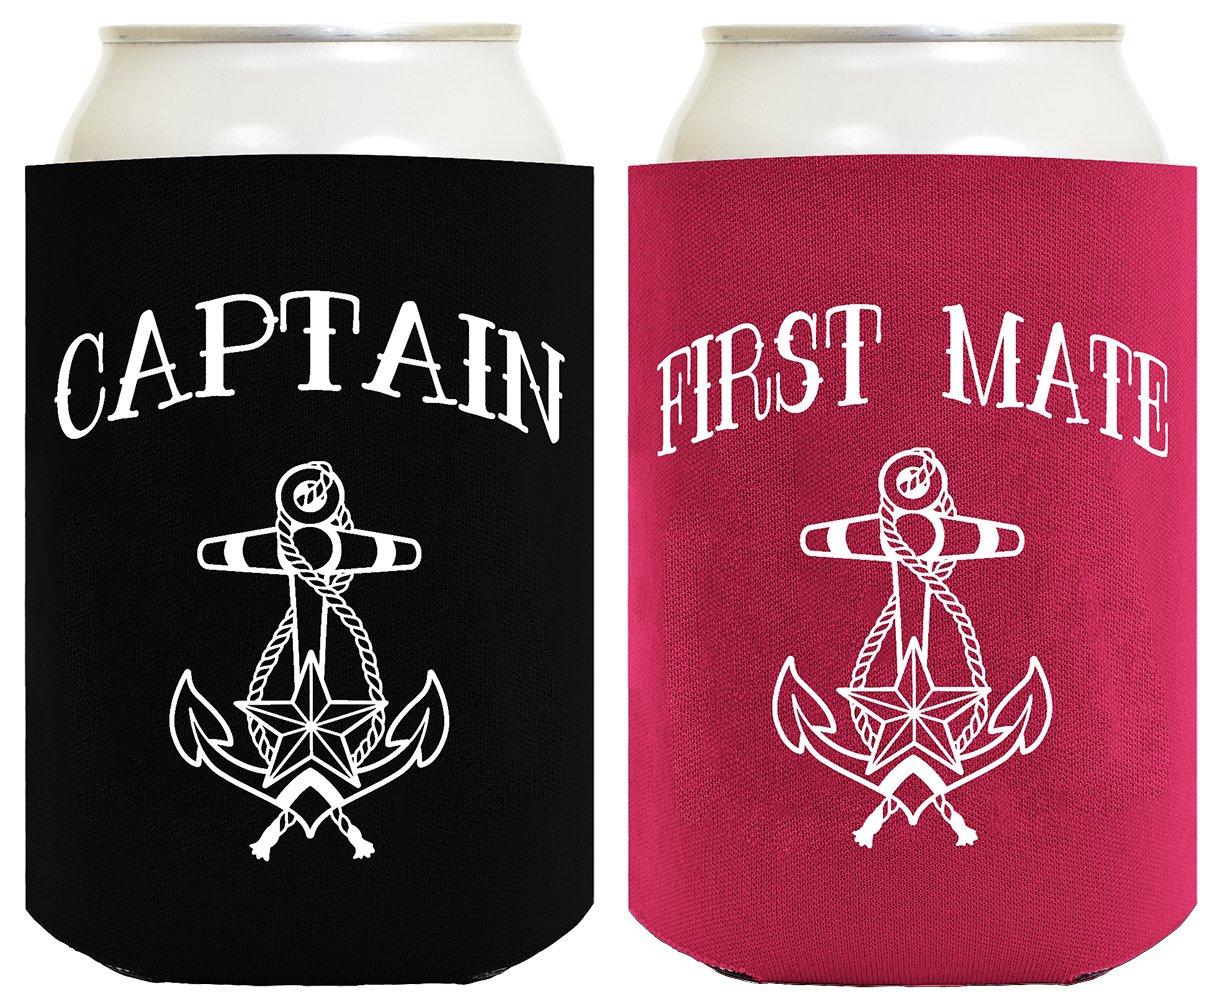 Captain and First Mate enfriadores de latas ThisWear A-P-RV-80-01-JIT01-02-Magenta